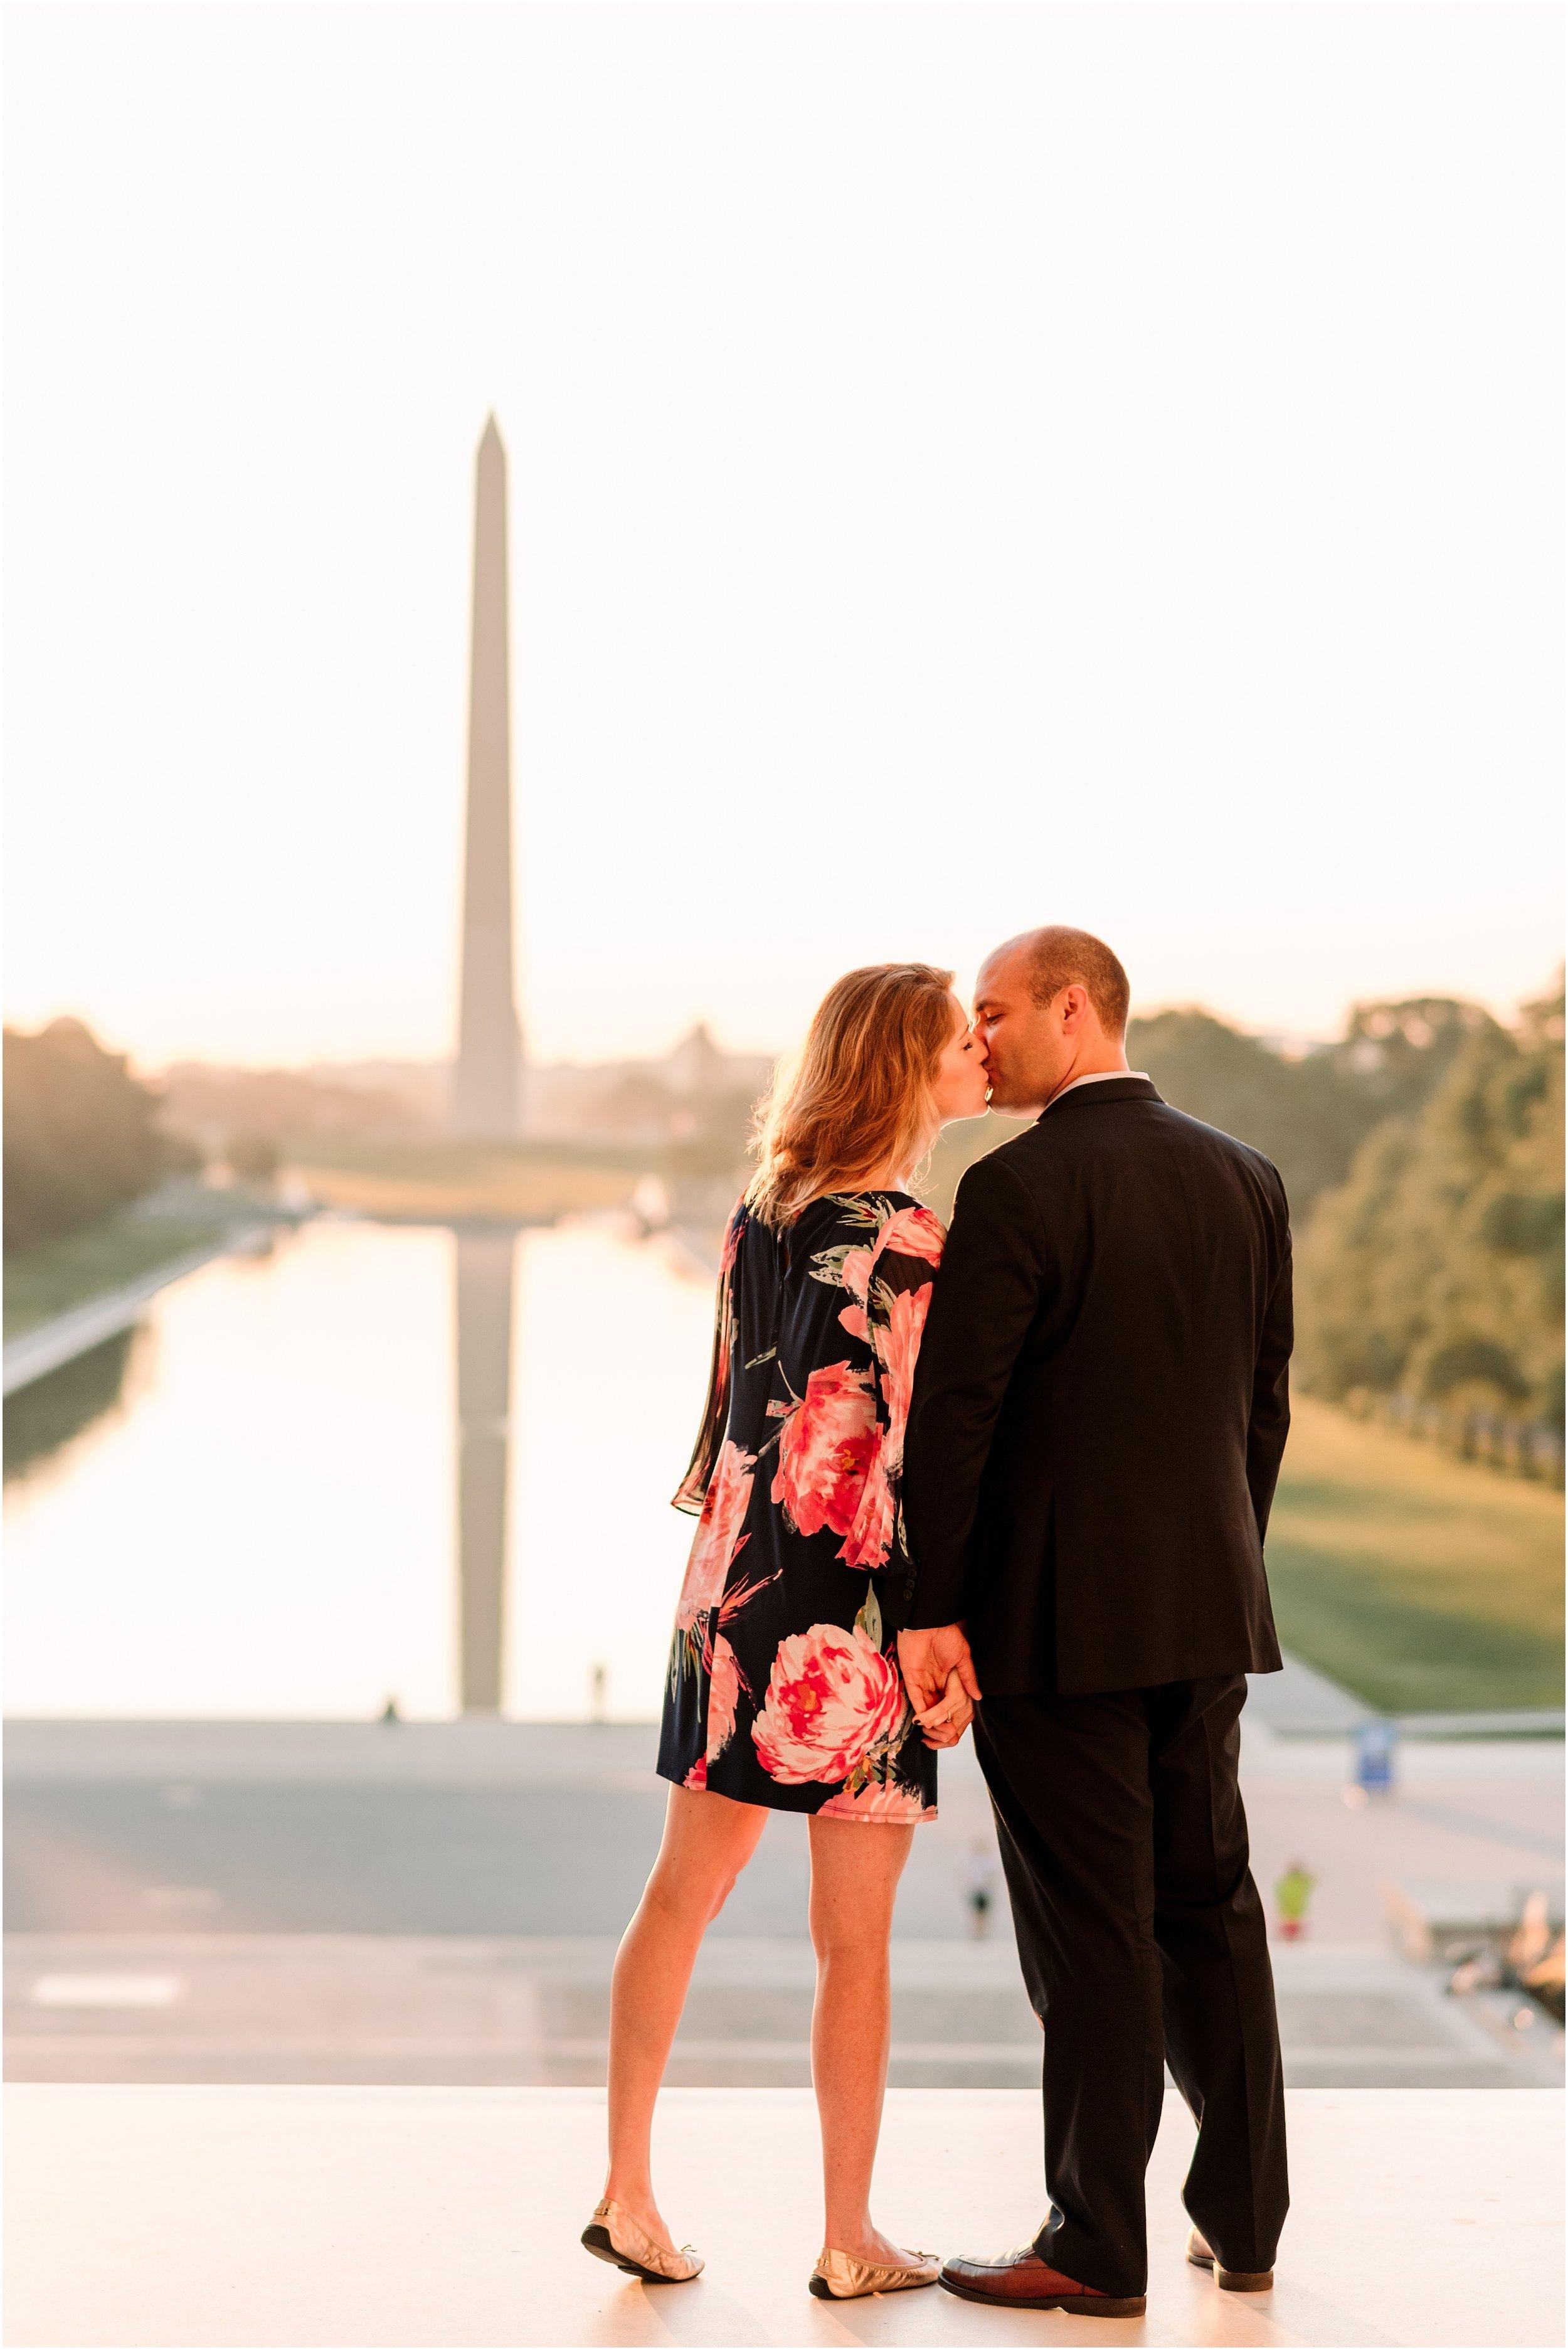 hannah leigh photography Sunrise Jefferson Memorial Engagement Session, Washington DC_1047.jpg